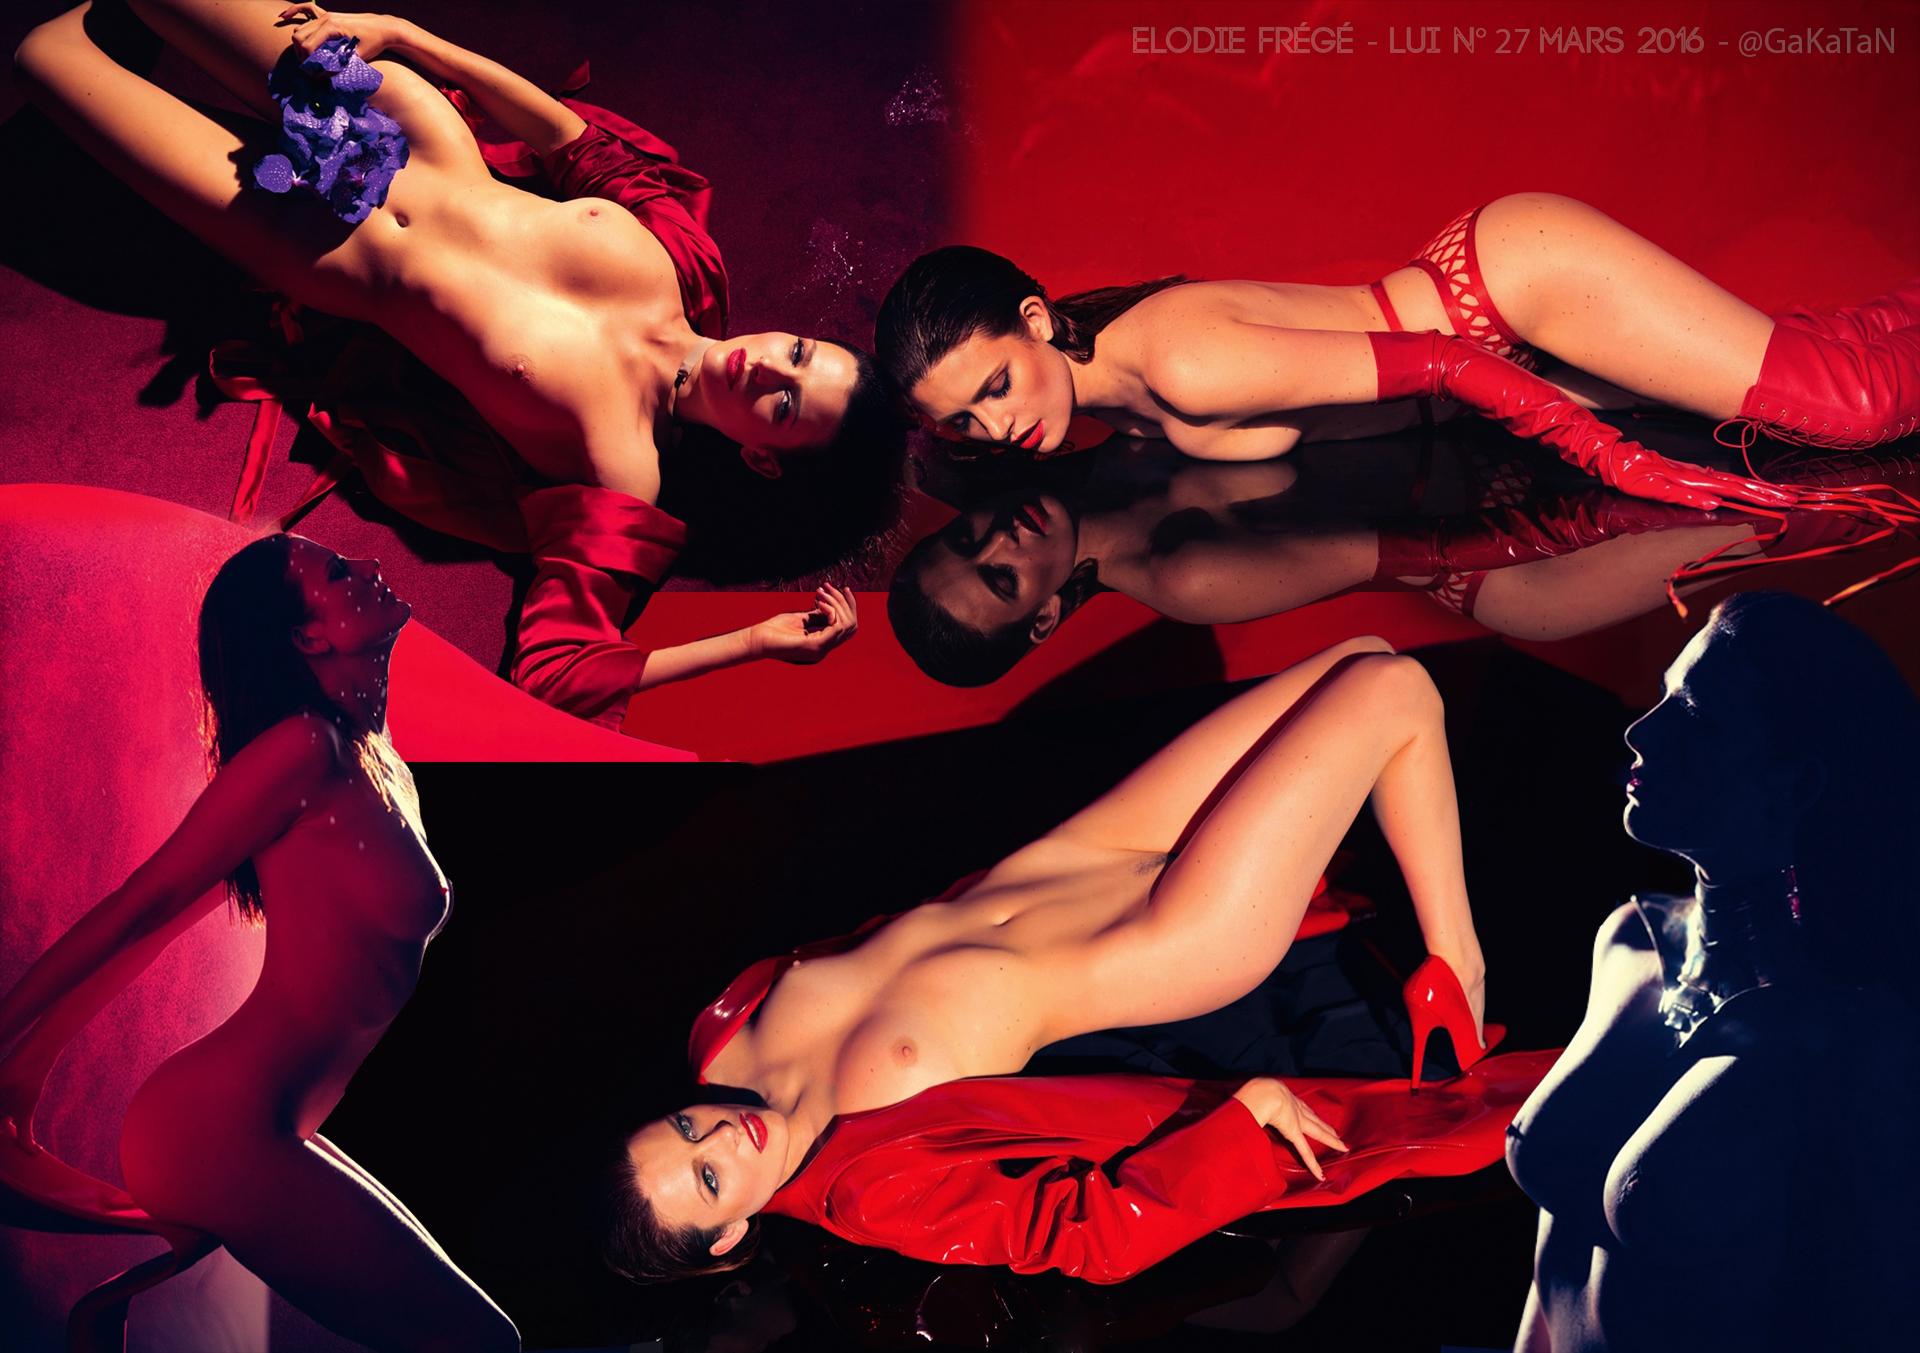 Lauren Layne Nude Photos and Videos,Michaela Mendez video Sex images Luna bijl tits,Vahina Giocante